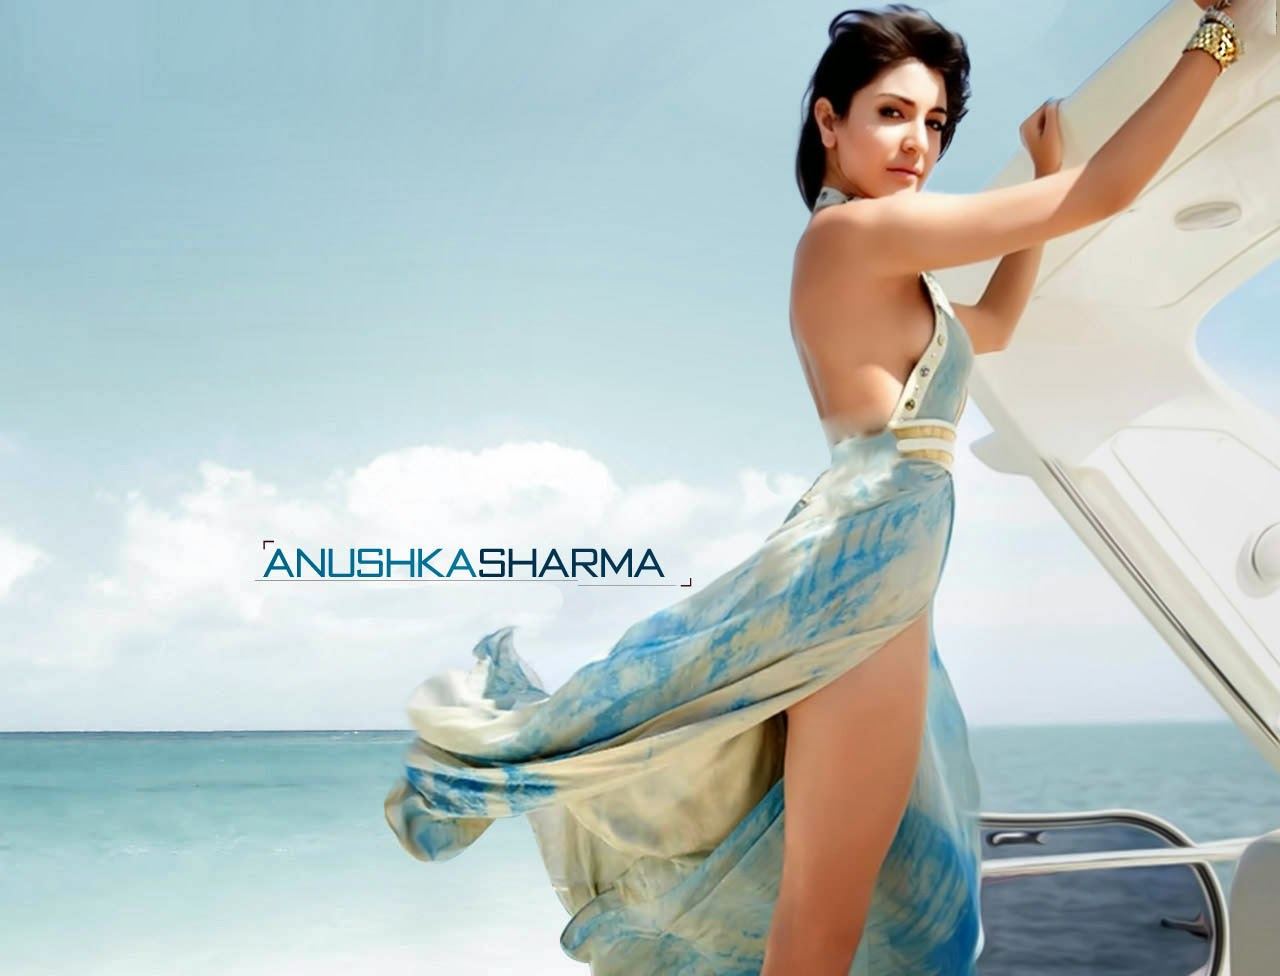 gorgeous anushka sharma hot look in short cloths pics